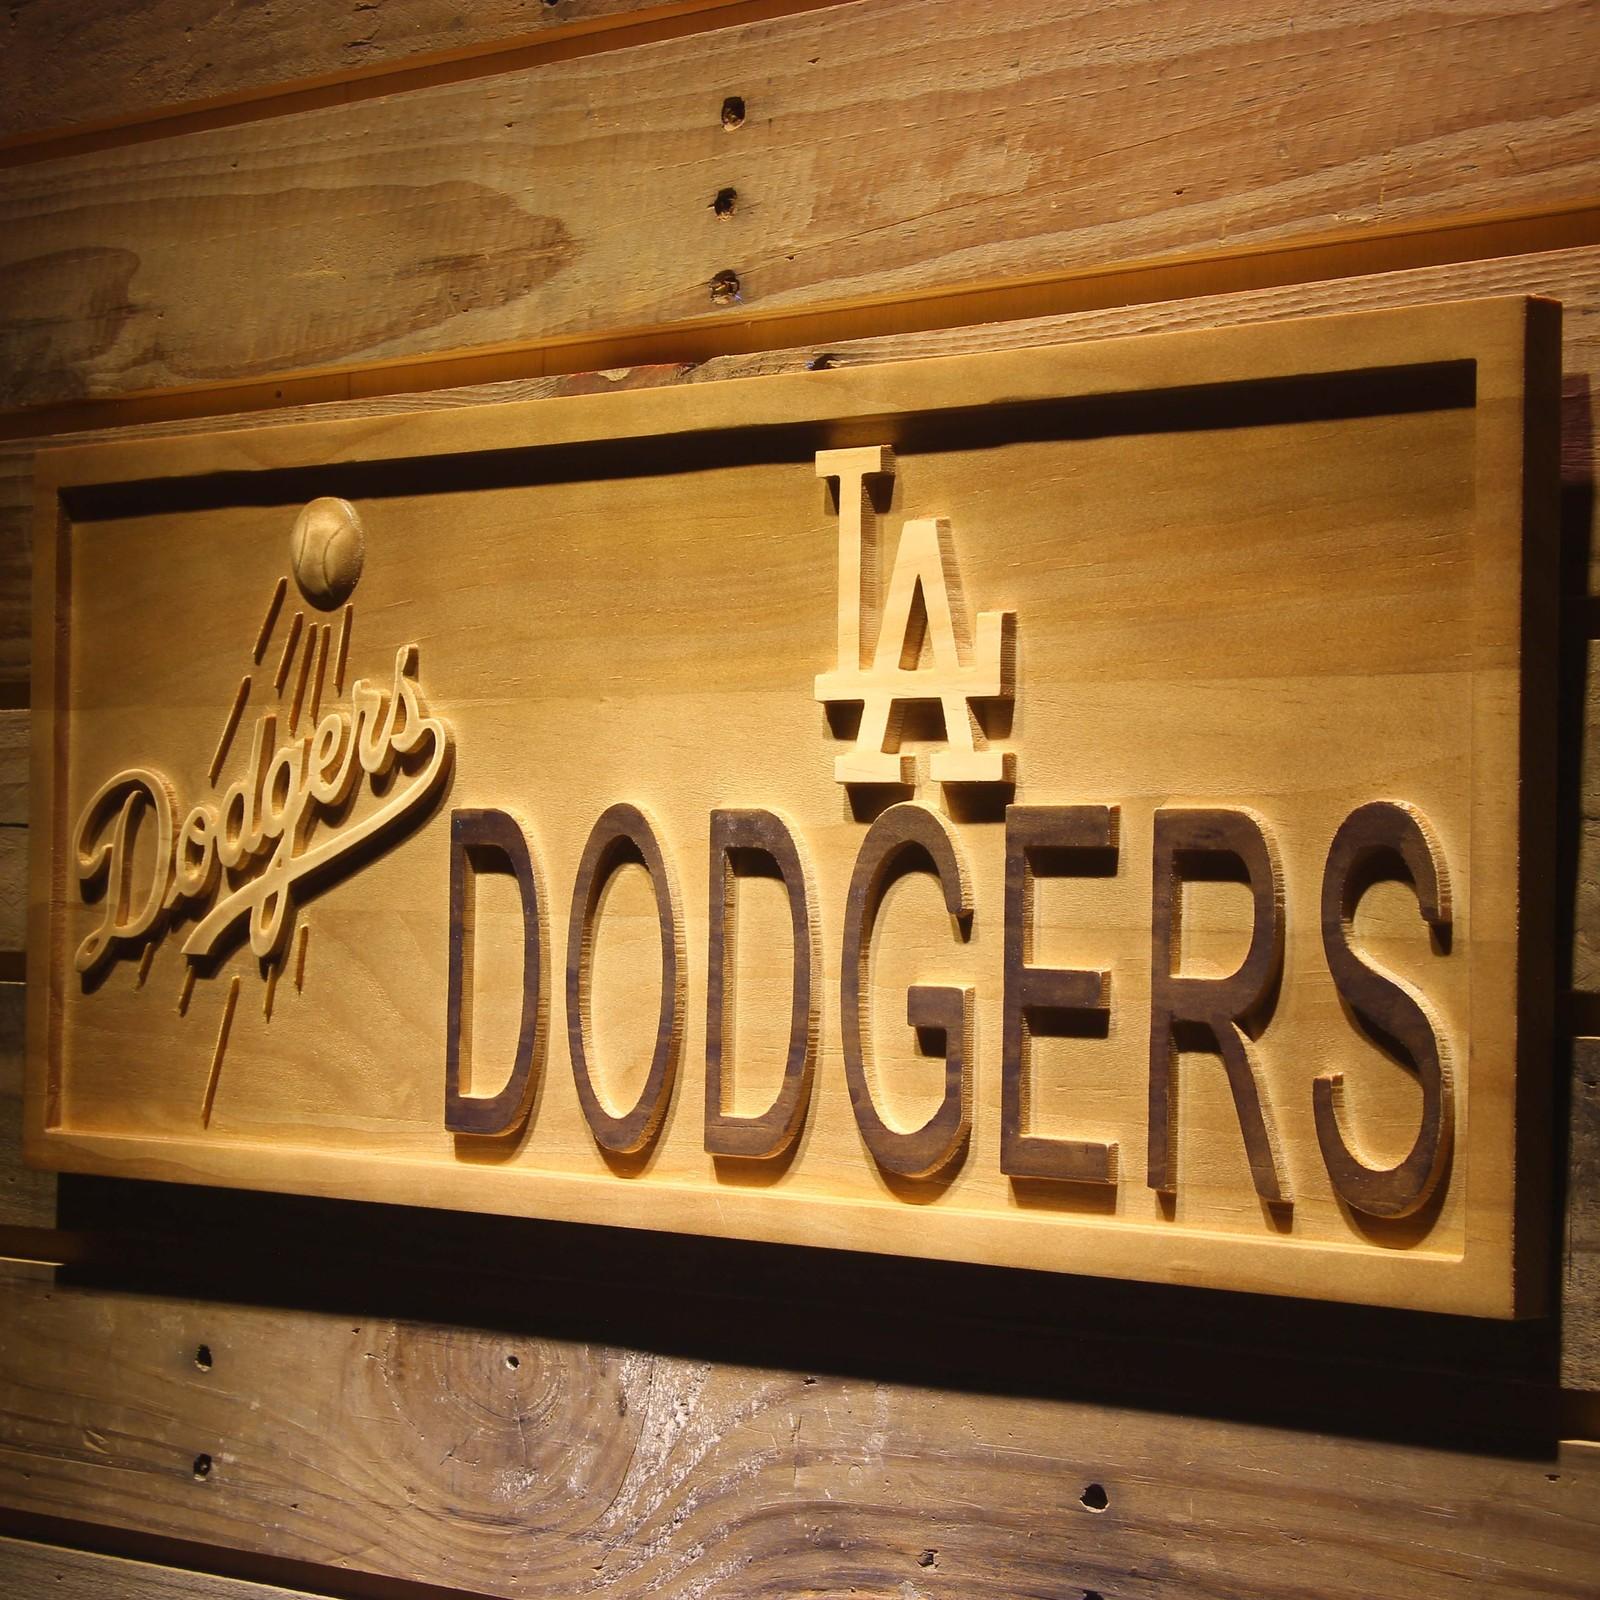 Baseball Home Decor: Los Angeles Dodgers MLB Baseball Team Wooden Sign Wall Art